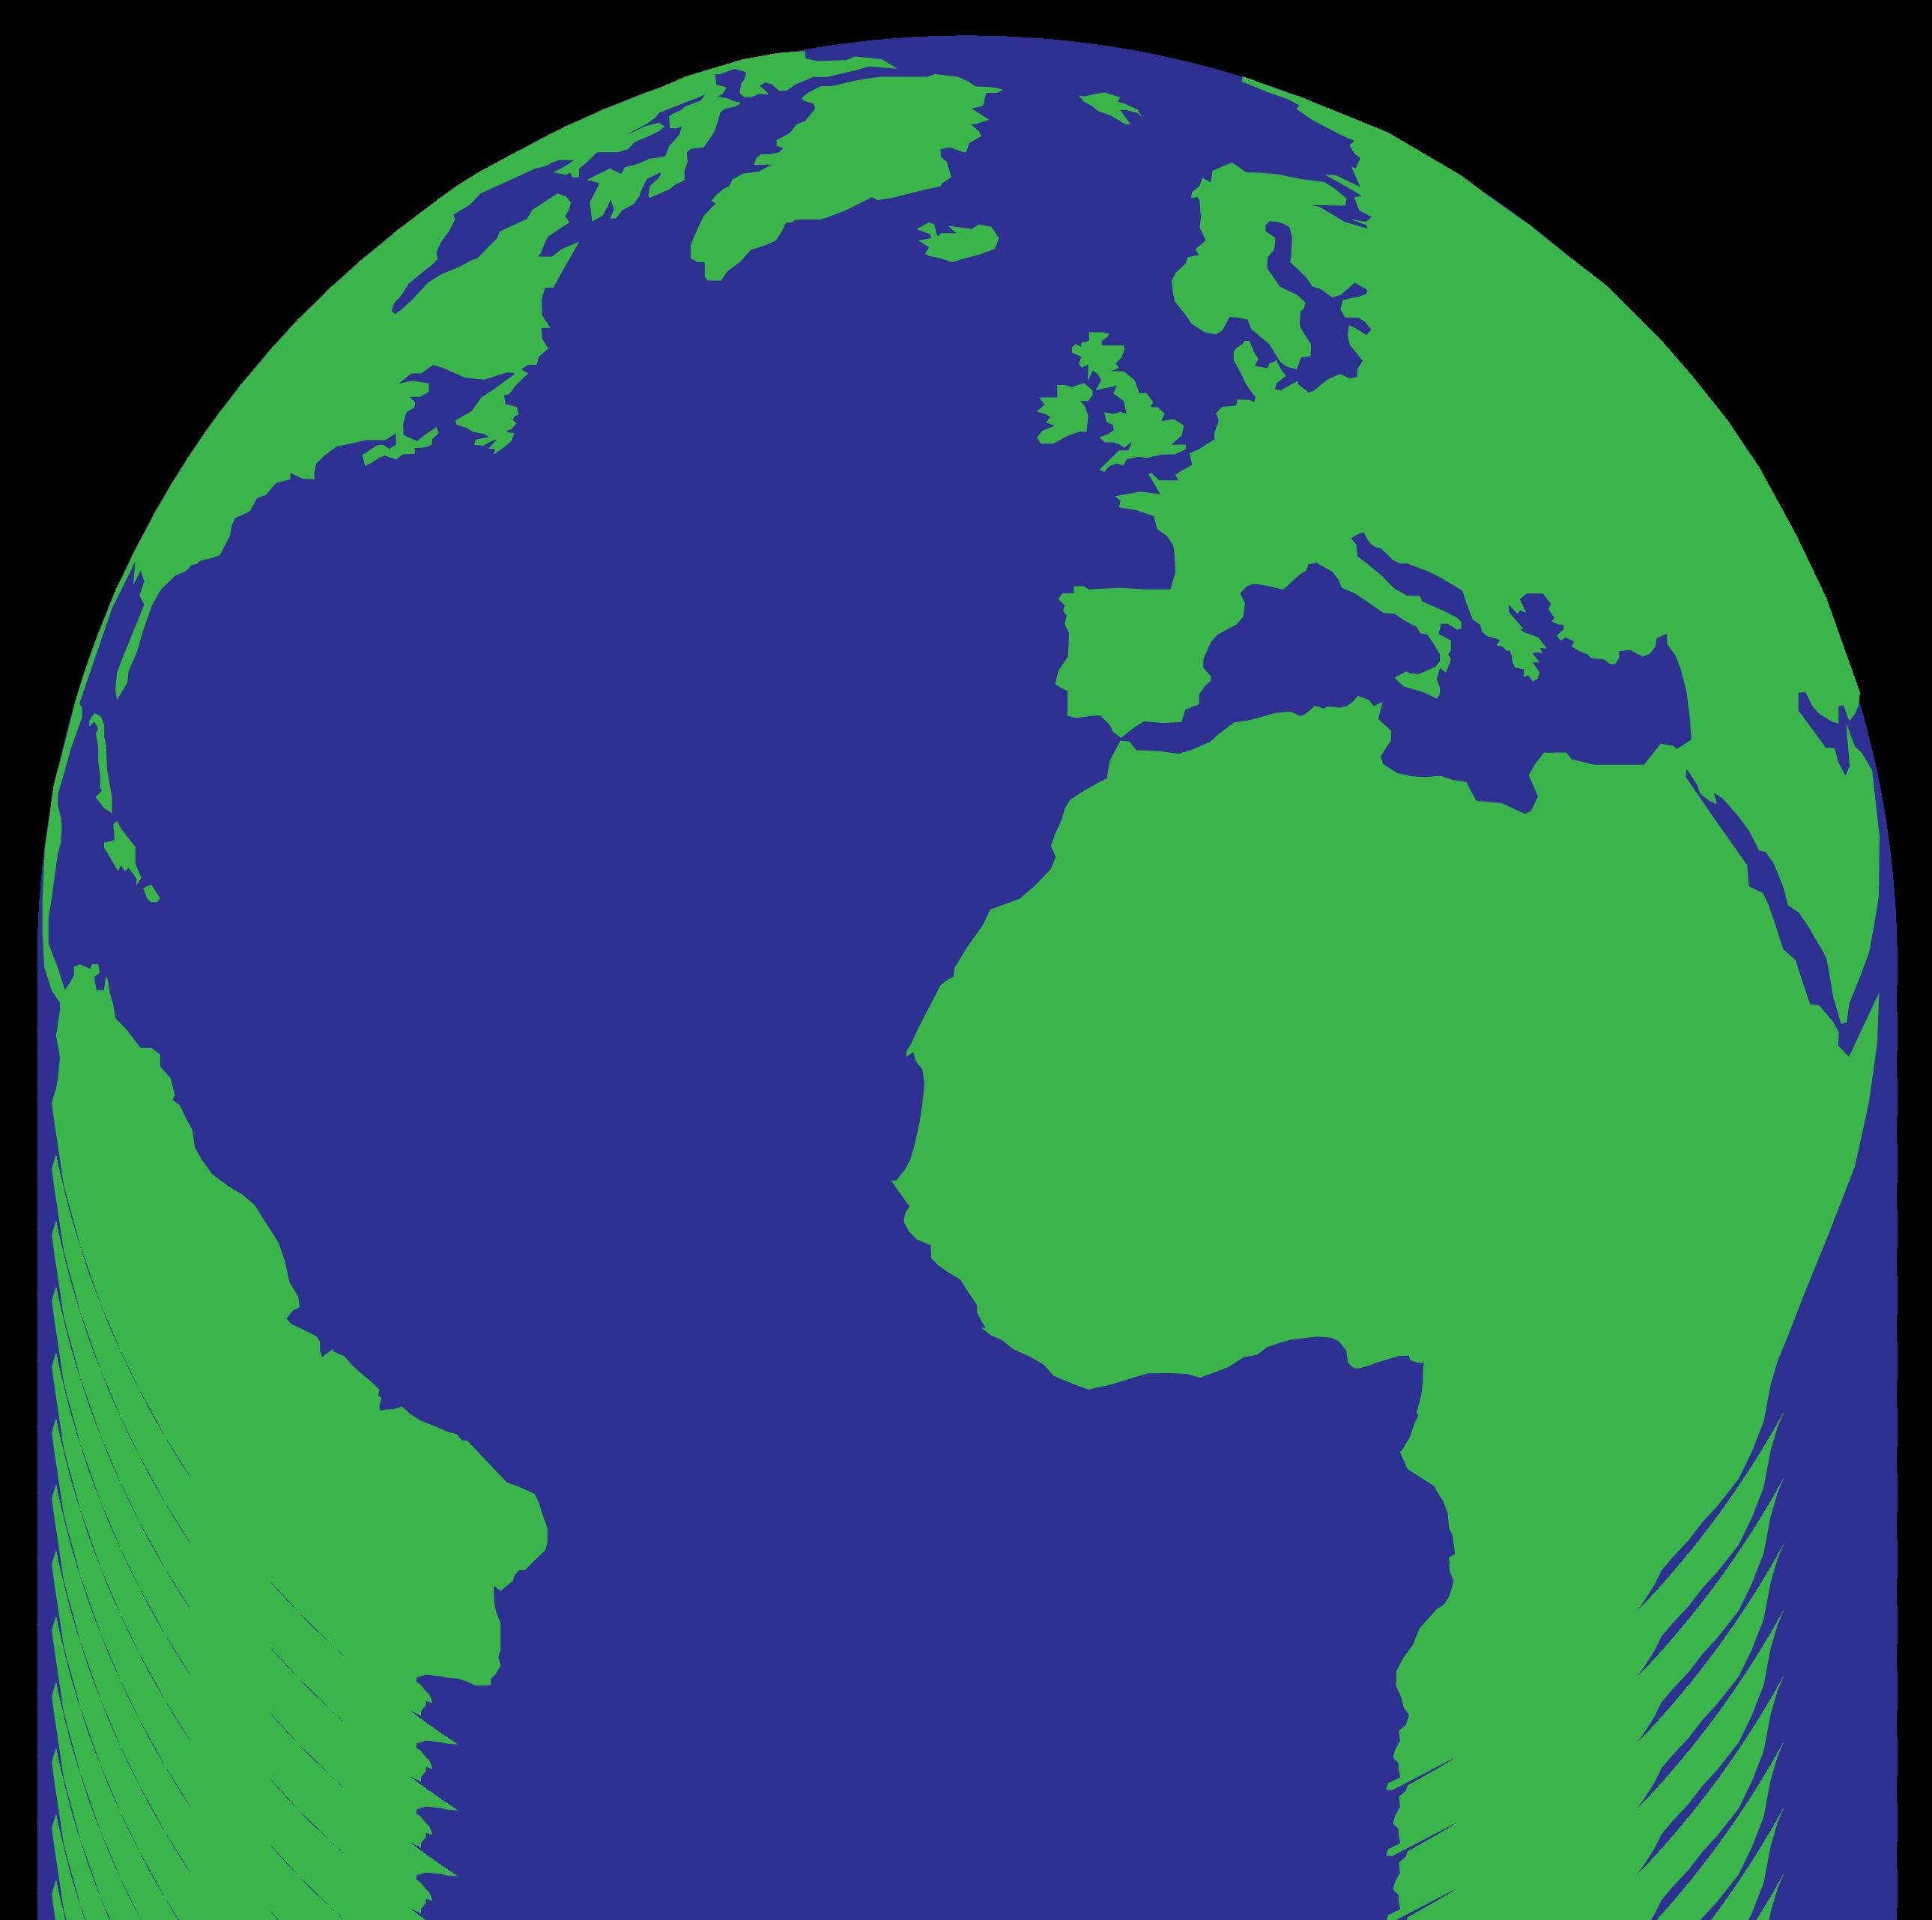 planet earth globe - photo #46